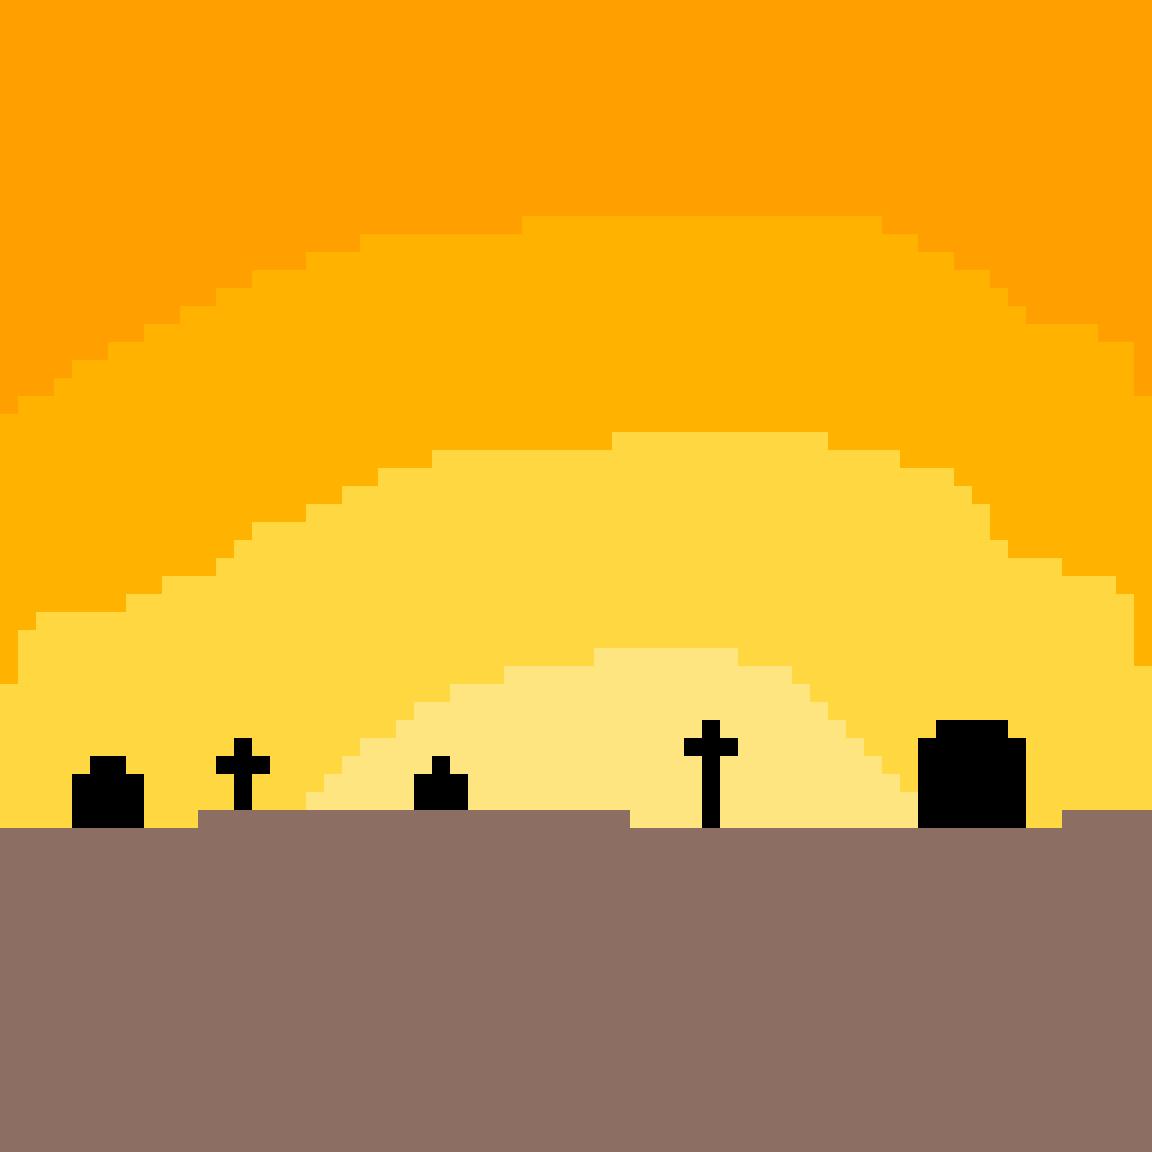 Graveyard by ashbeesh